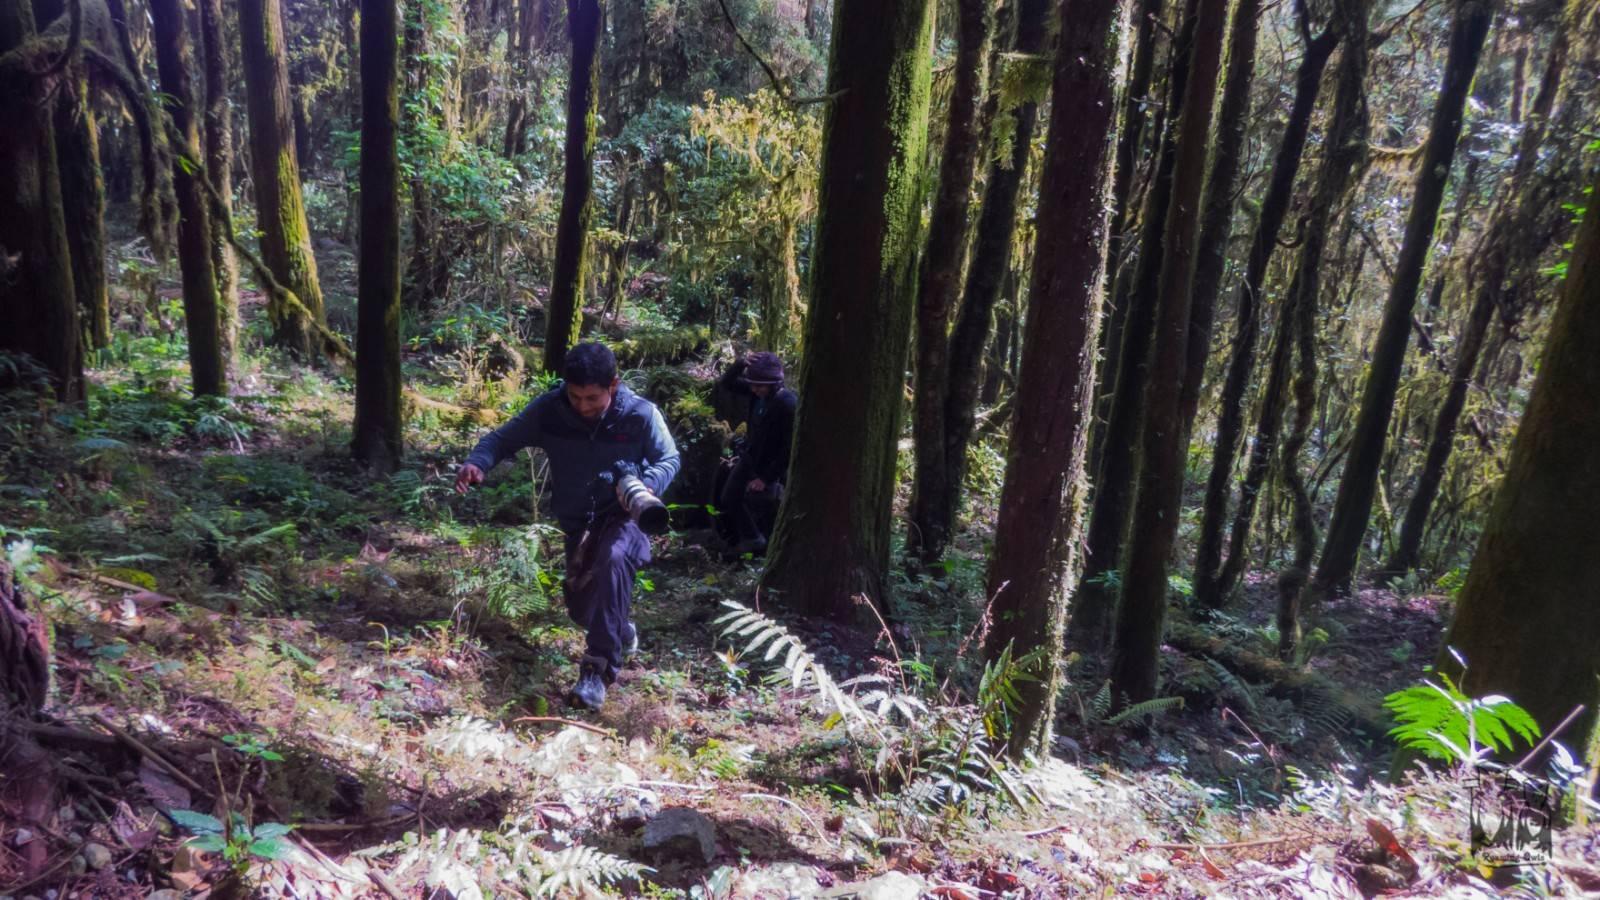 Neora valley national park, trekking, birding